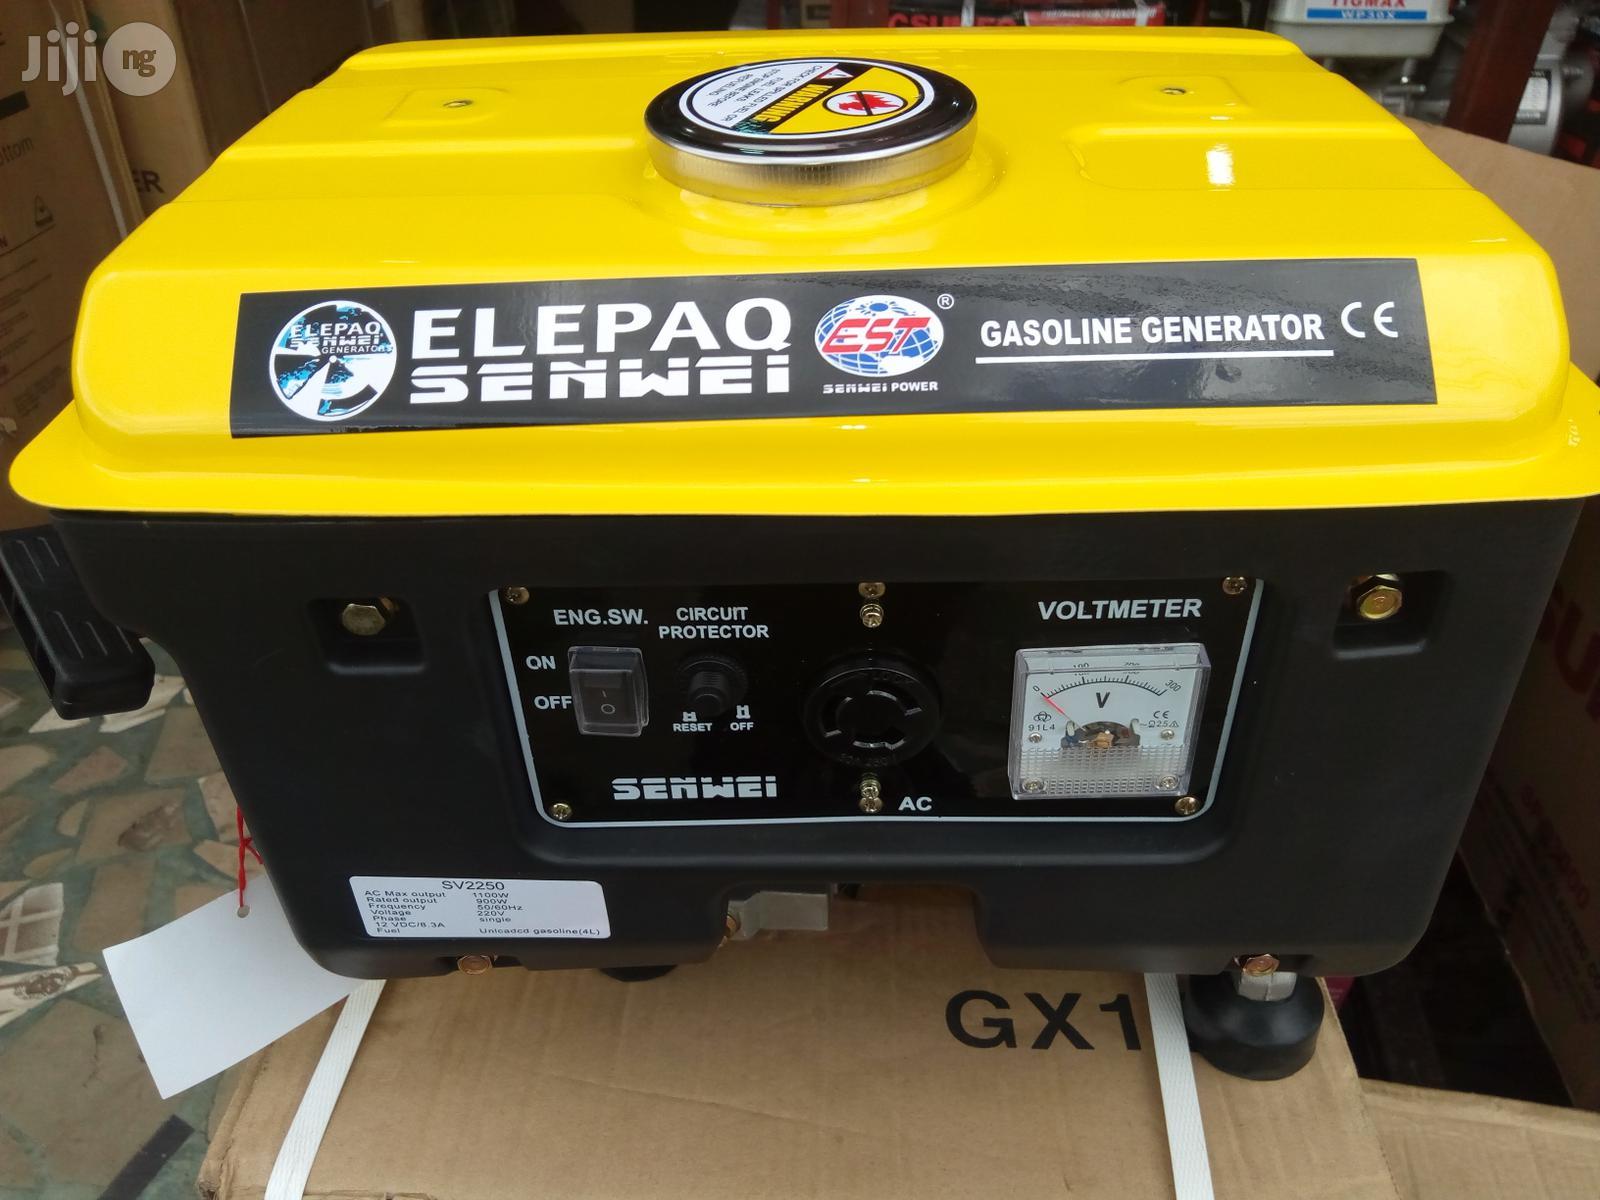 ELEPAQ Senwei Generator Model 1850 (1.1kva)